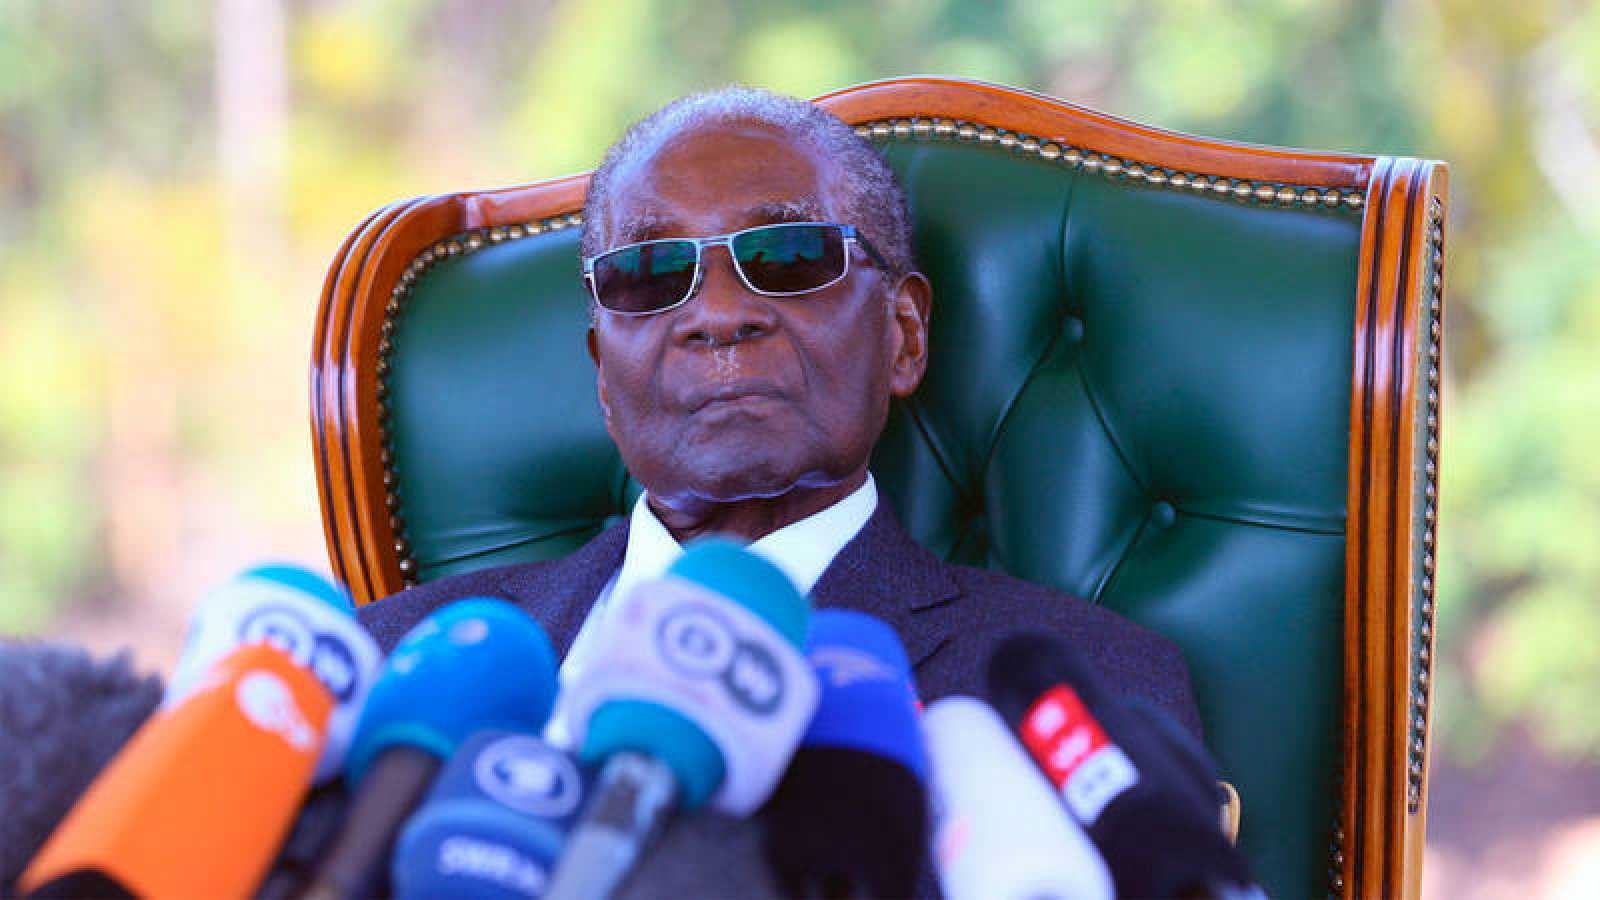 Resultado de imagen para Robert Mugabe